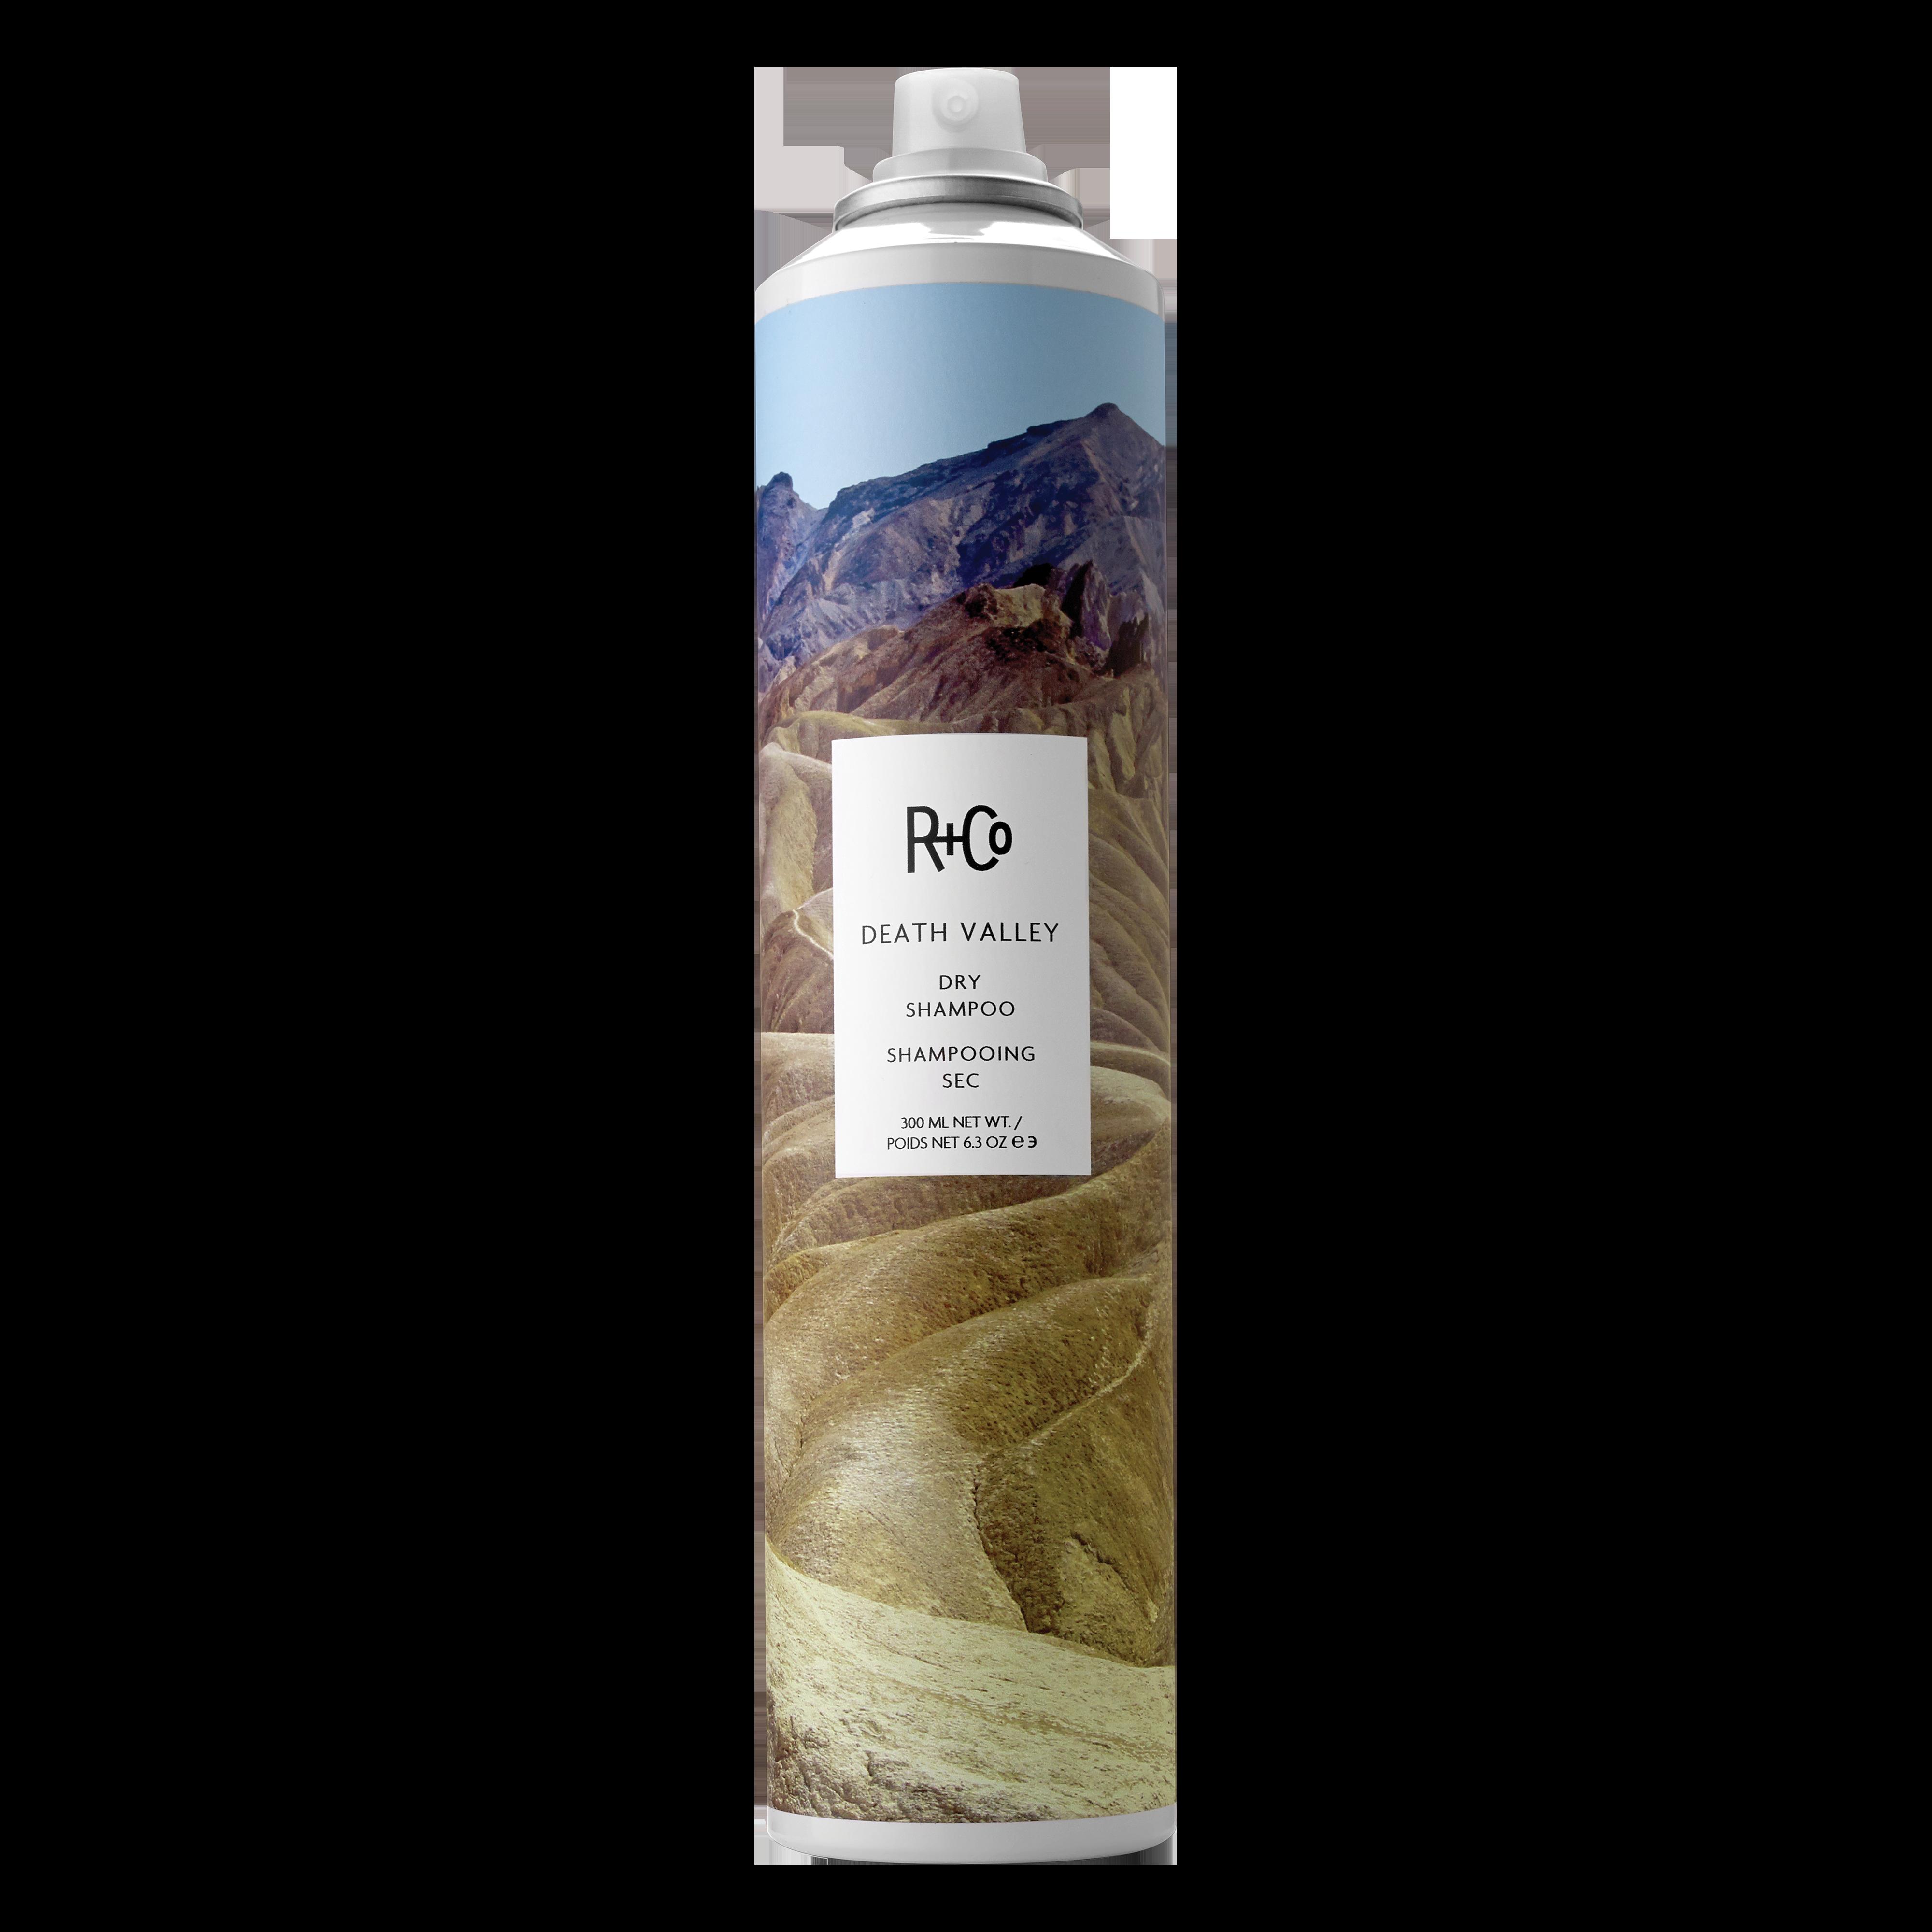 DEATH VALLEY Dry Shampoo 300ml